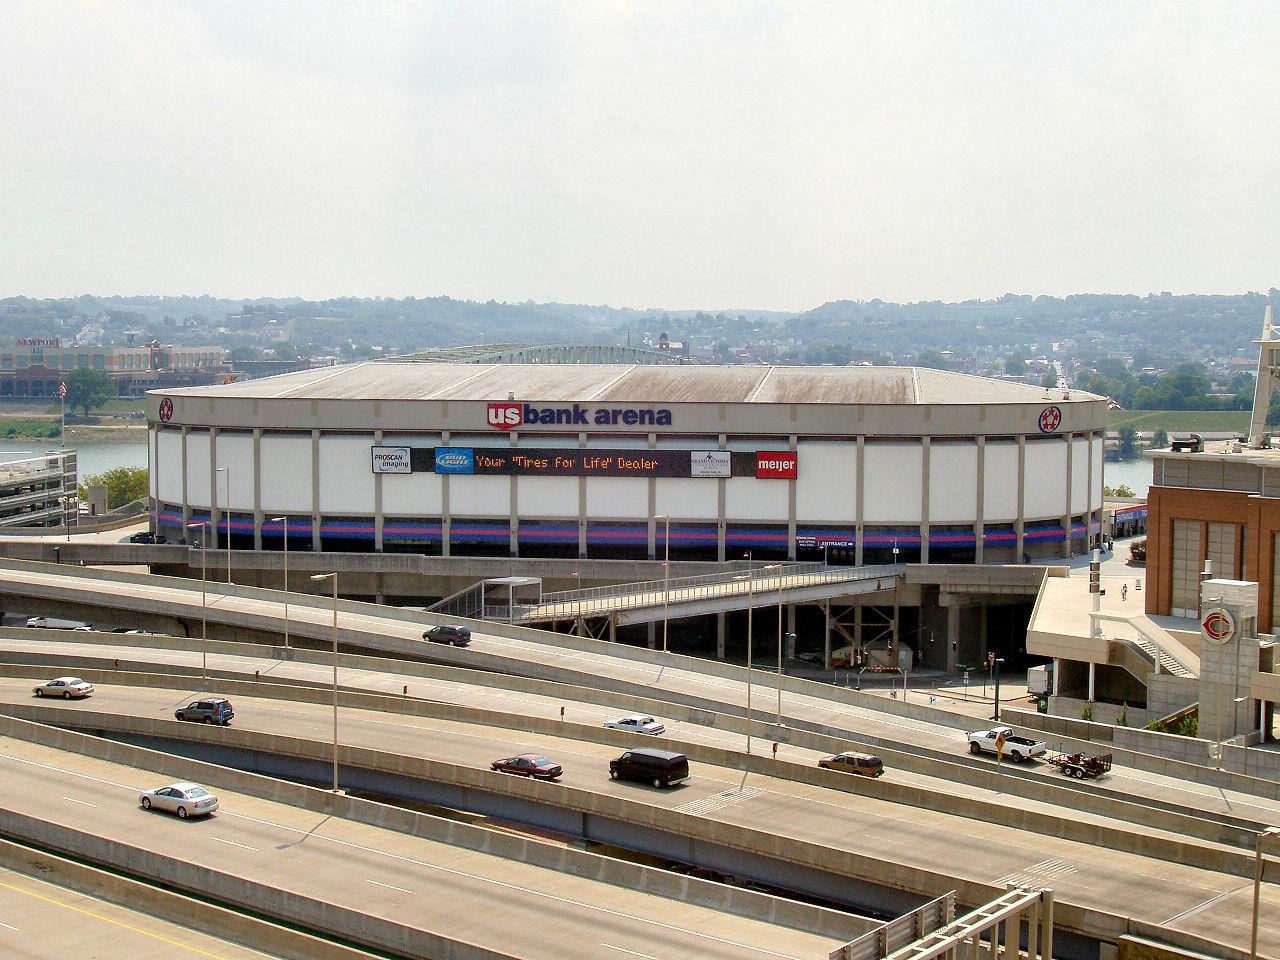 1280px-Cincinnati-us-bank-arena.jpg